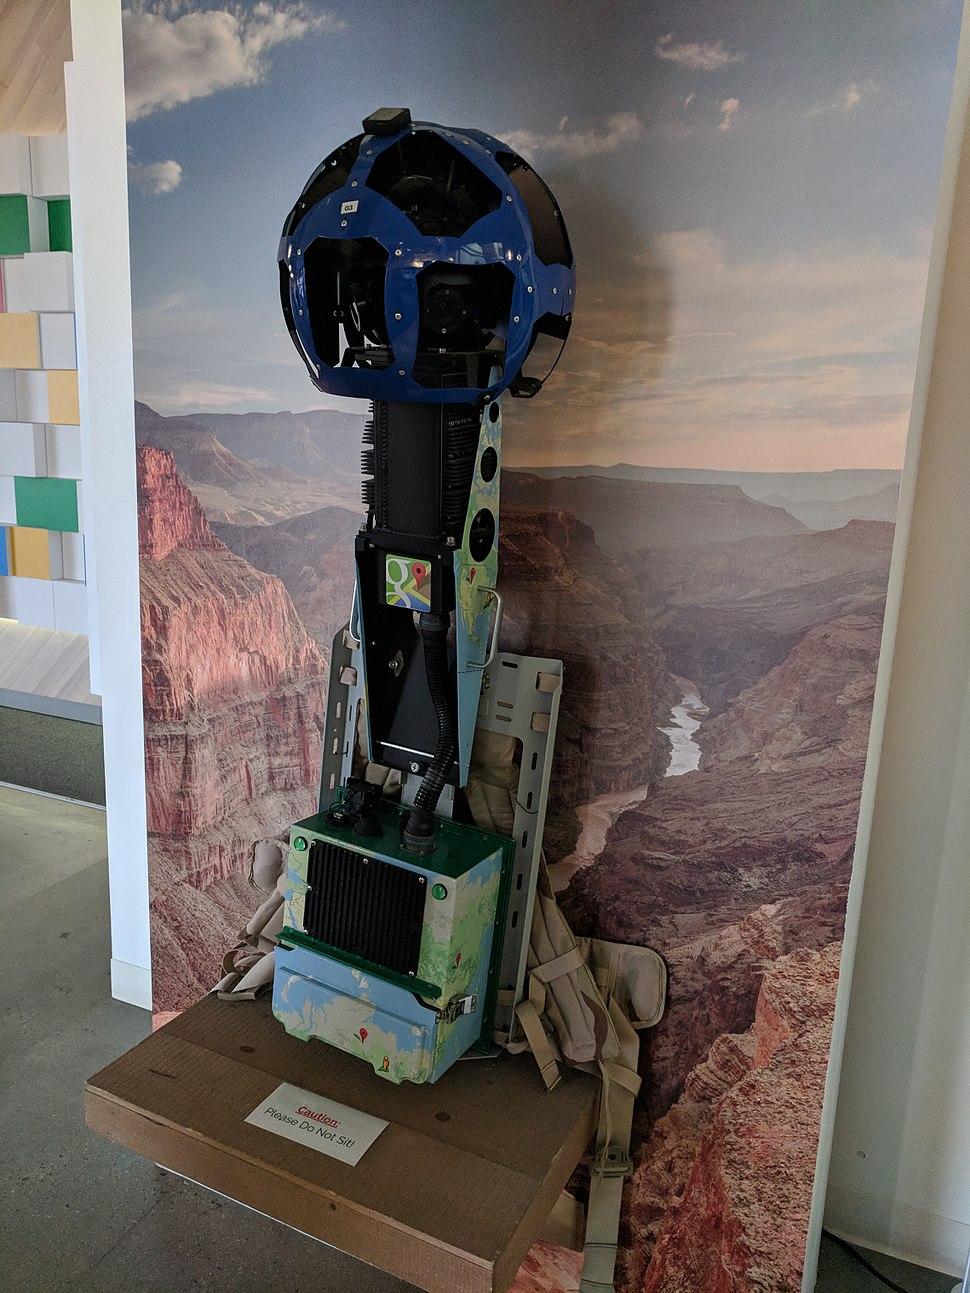 Google Street View backpack camera